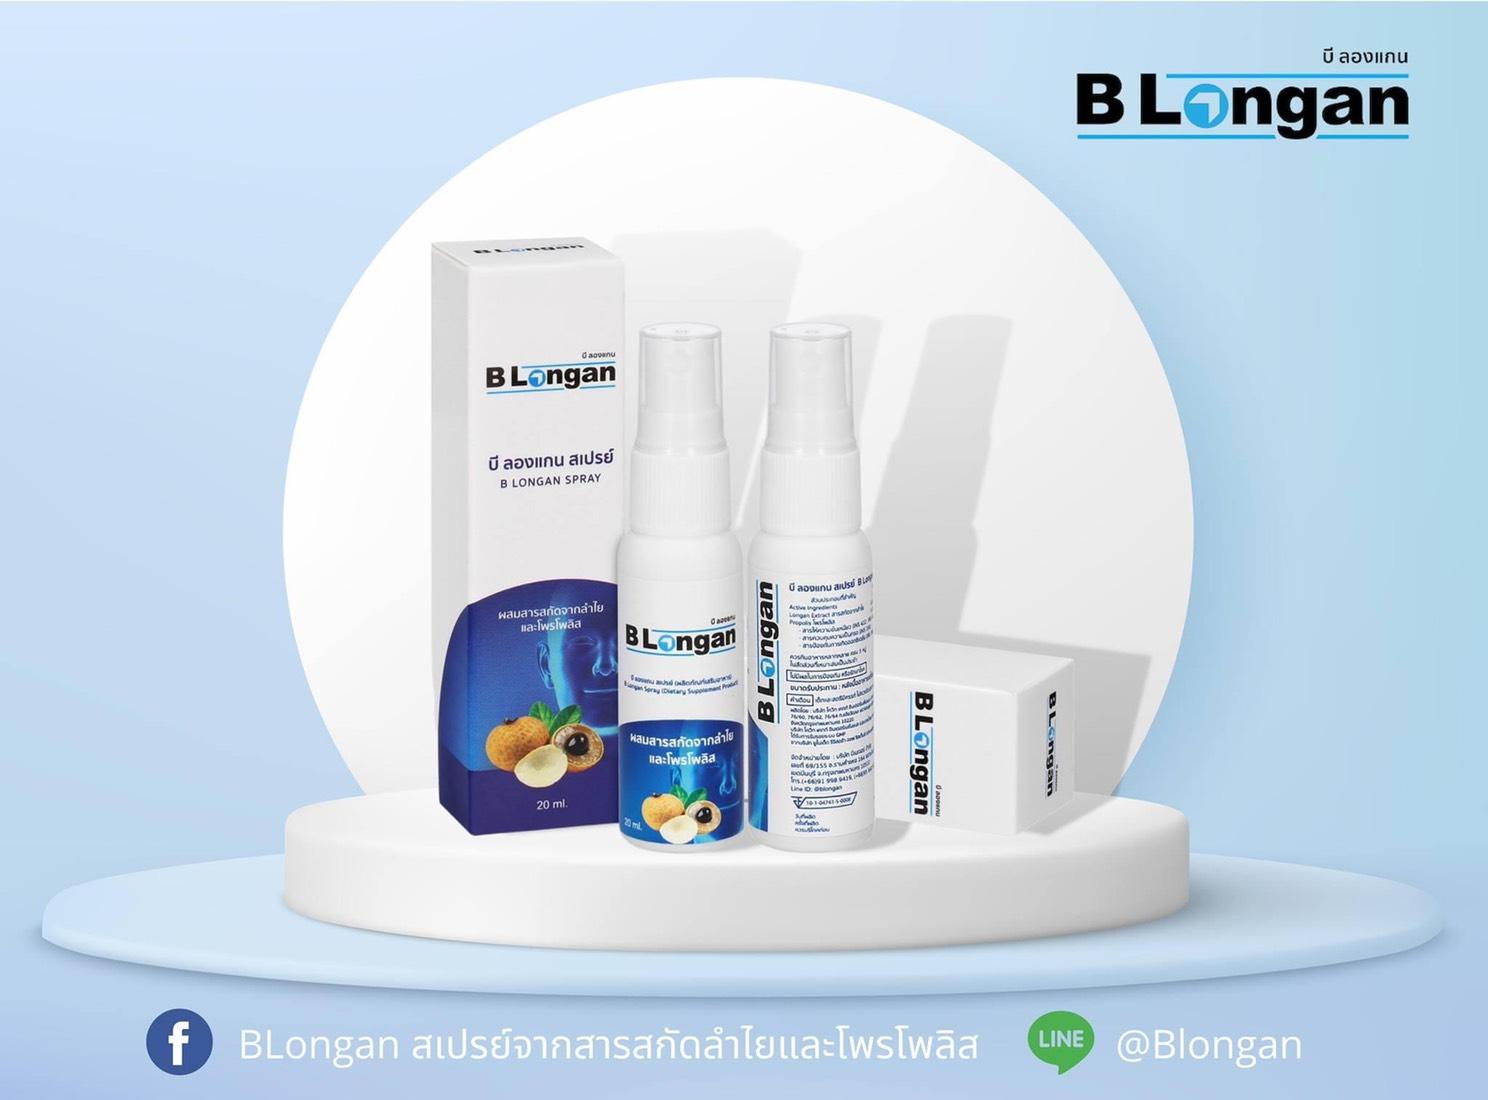 B Longan Mouth Spray